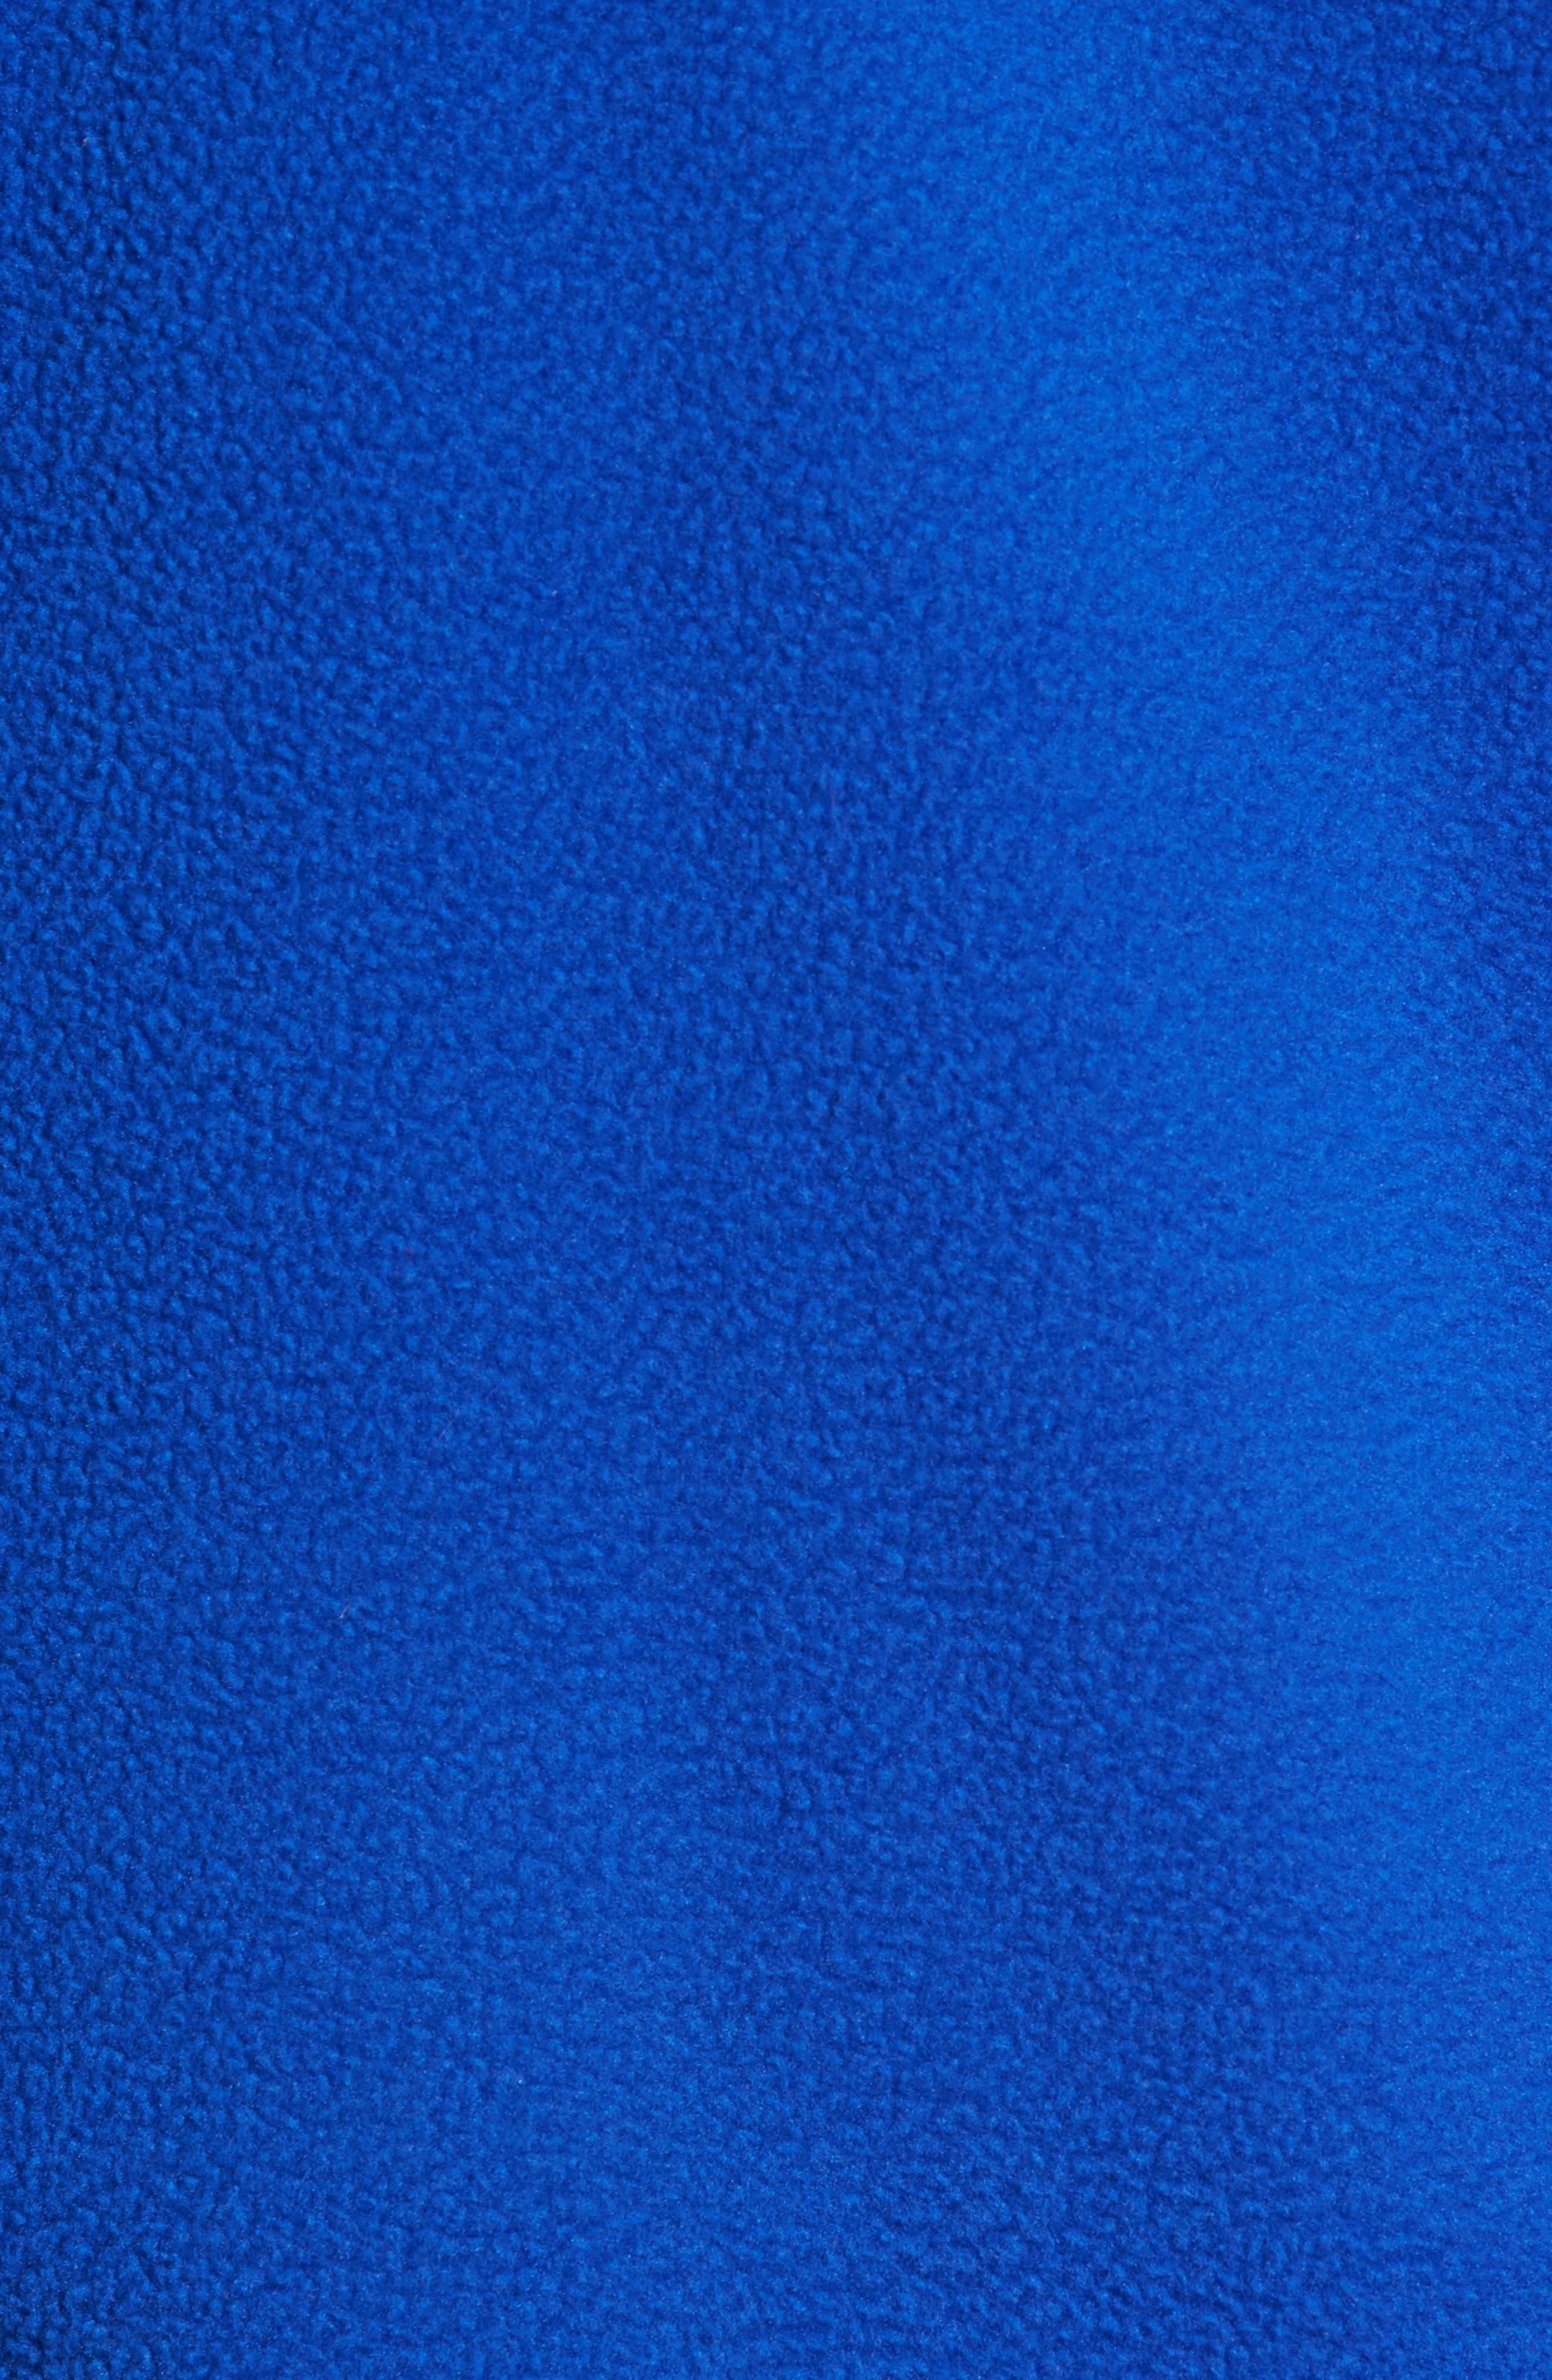 TJM Classics Half Zip Fleece Pullover,                             Alternate thumbnail 5, color,                             SURF THE WEB